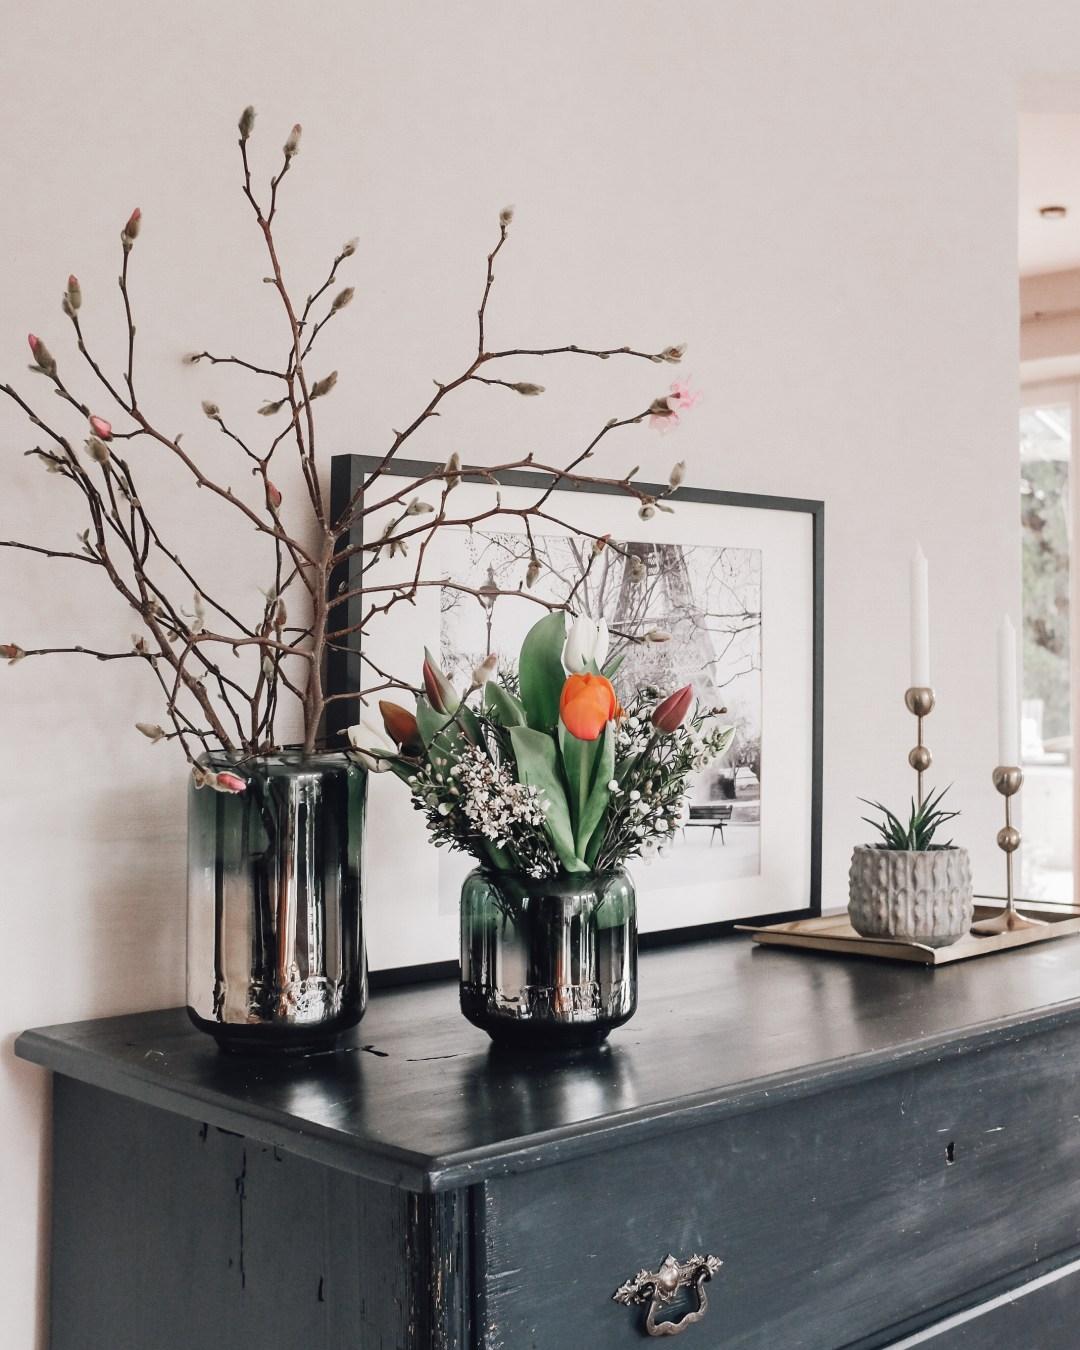 inastil, fühlingsdekoration, magnolien, Karomantel, Ü50Mode, Stylingtipps, Modeberatung, Übergangsmantel, Blazermantel, Hallein, Frühling-6